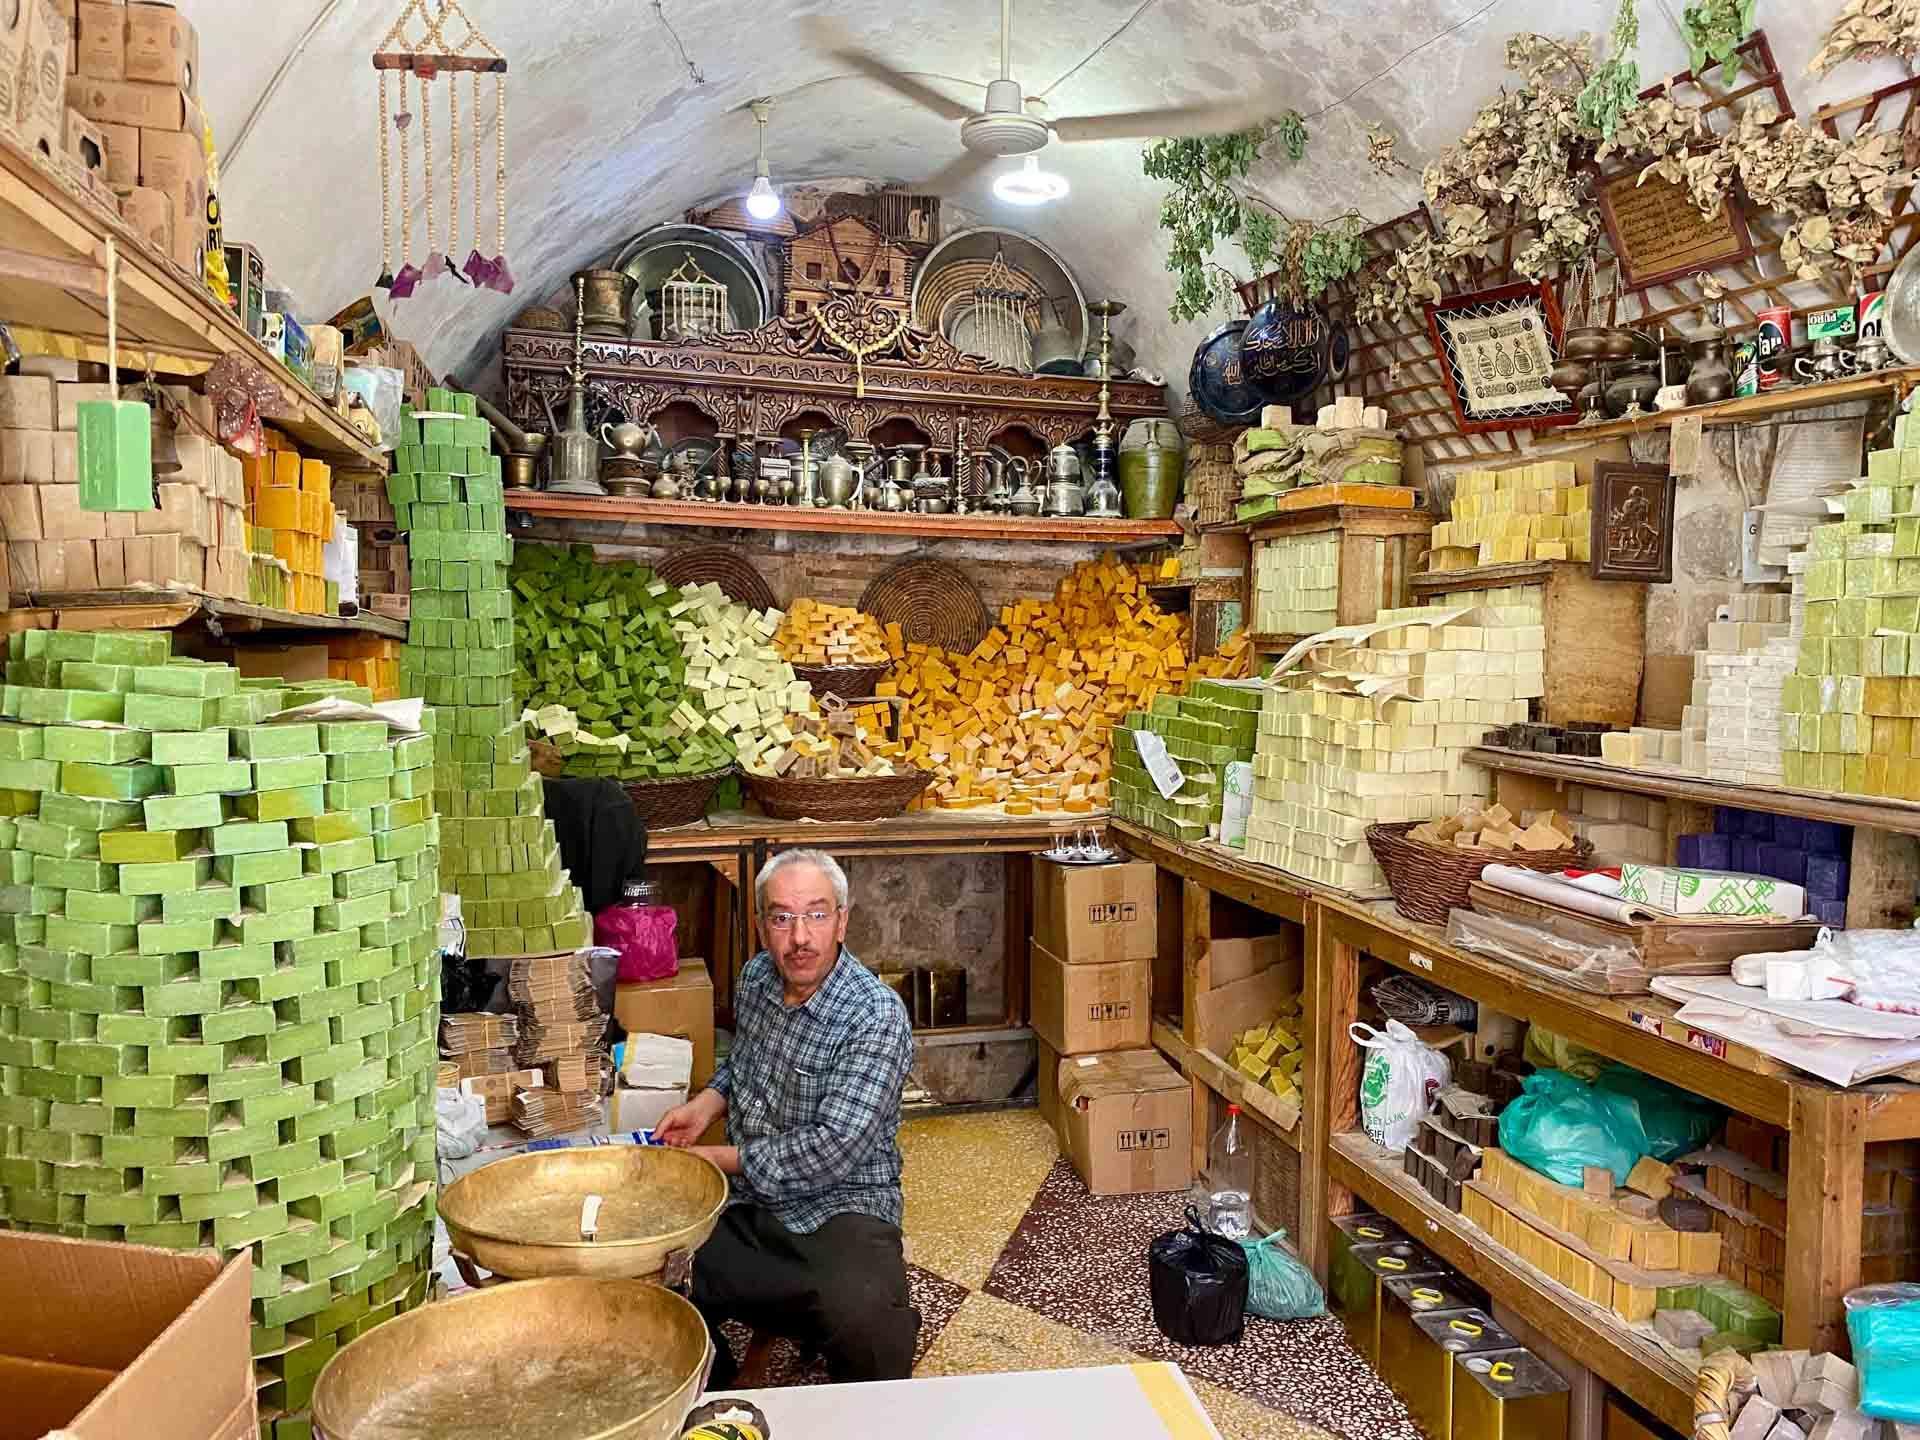 La boutique de savons Tek Sabuncu de Mehmet Dede a Mardin © Emmanuel Laveran